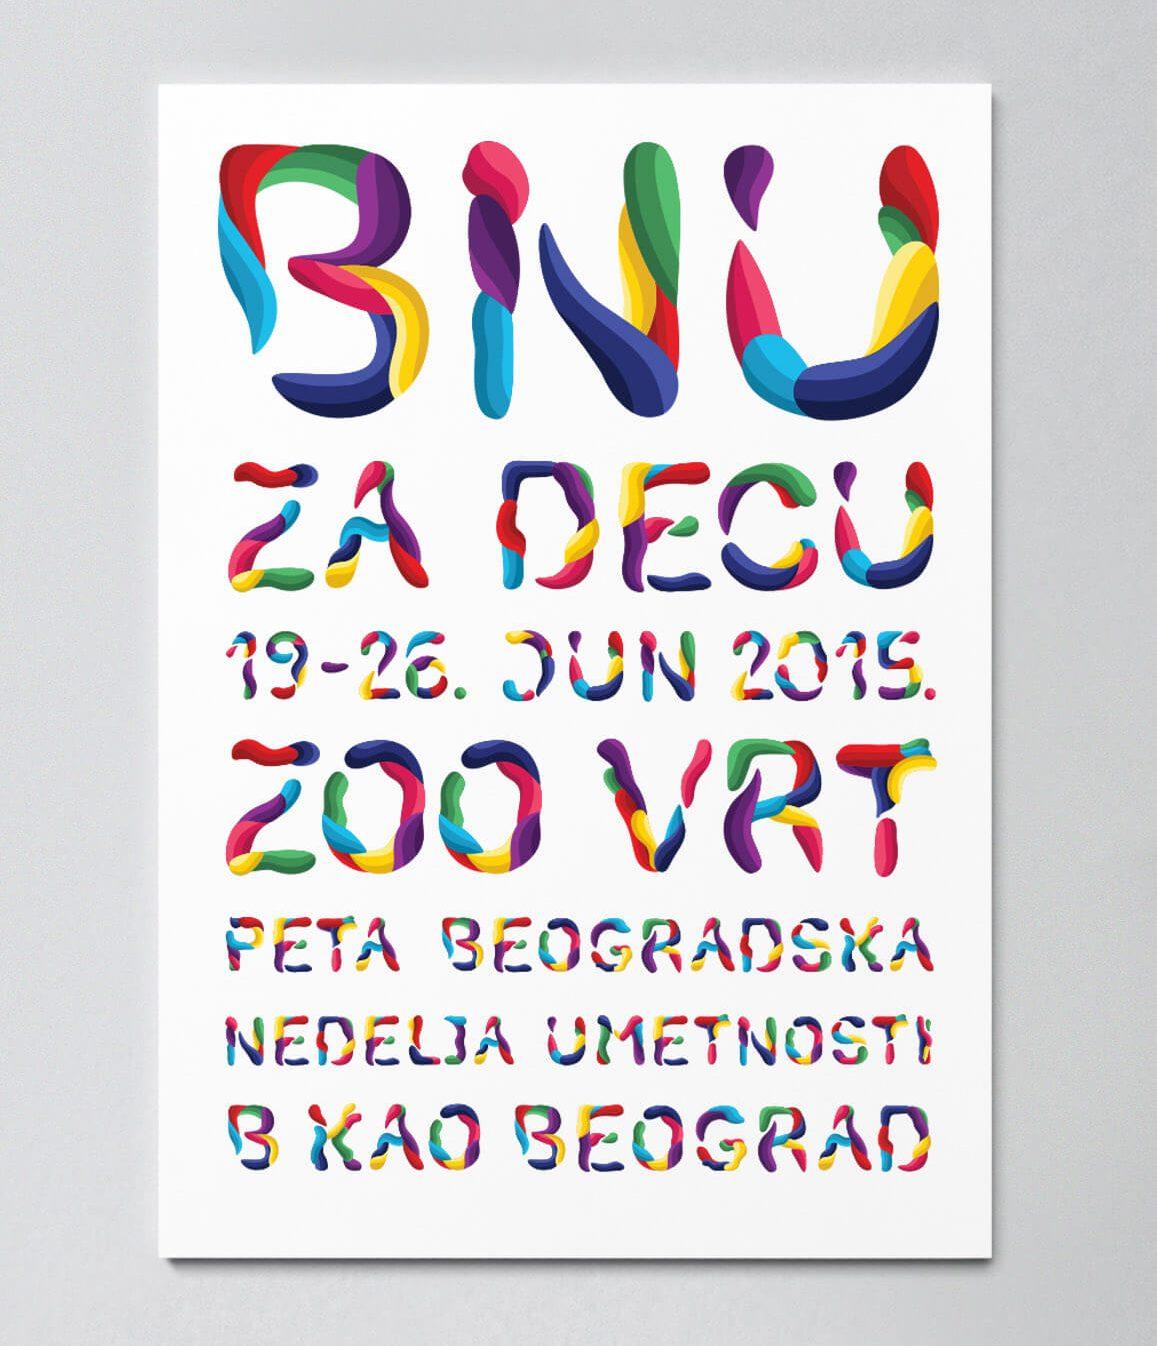 BNU_BelgradeWeekOfArt_Festival_Shonski_Visual Identity_Flayer2